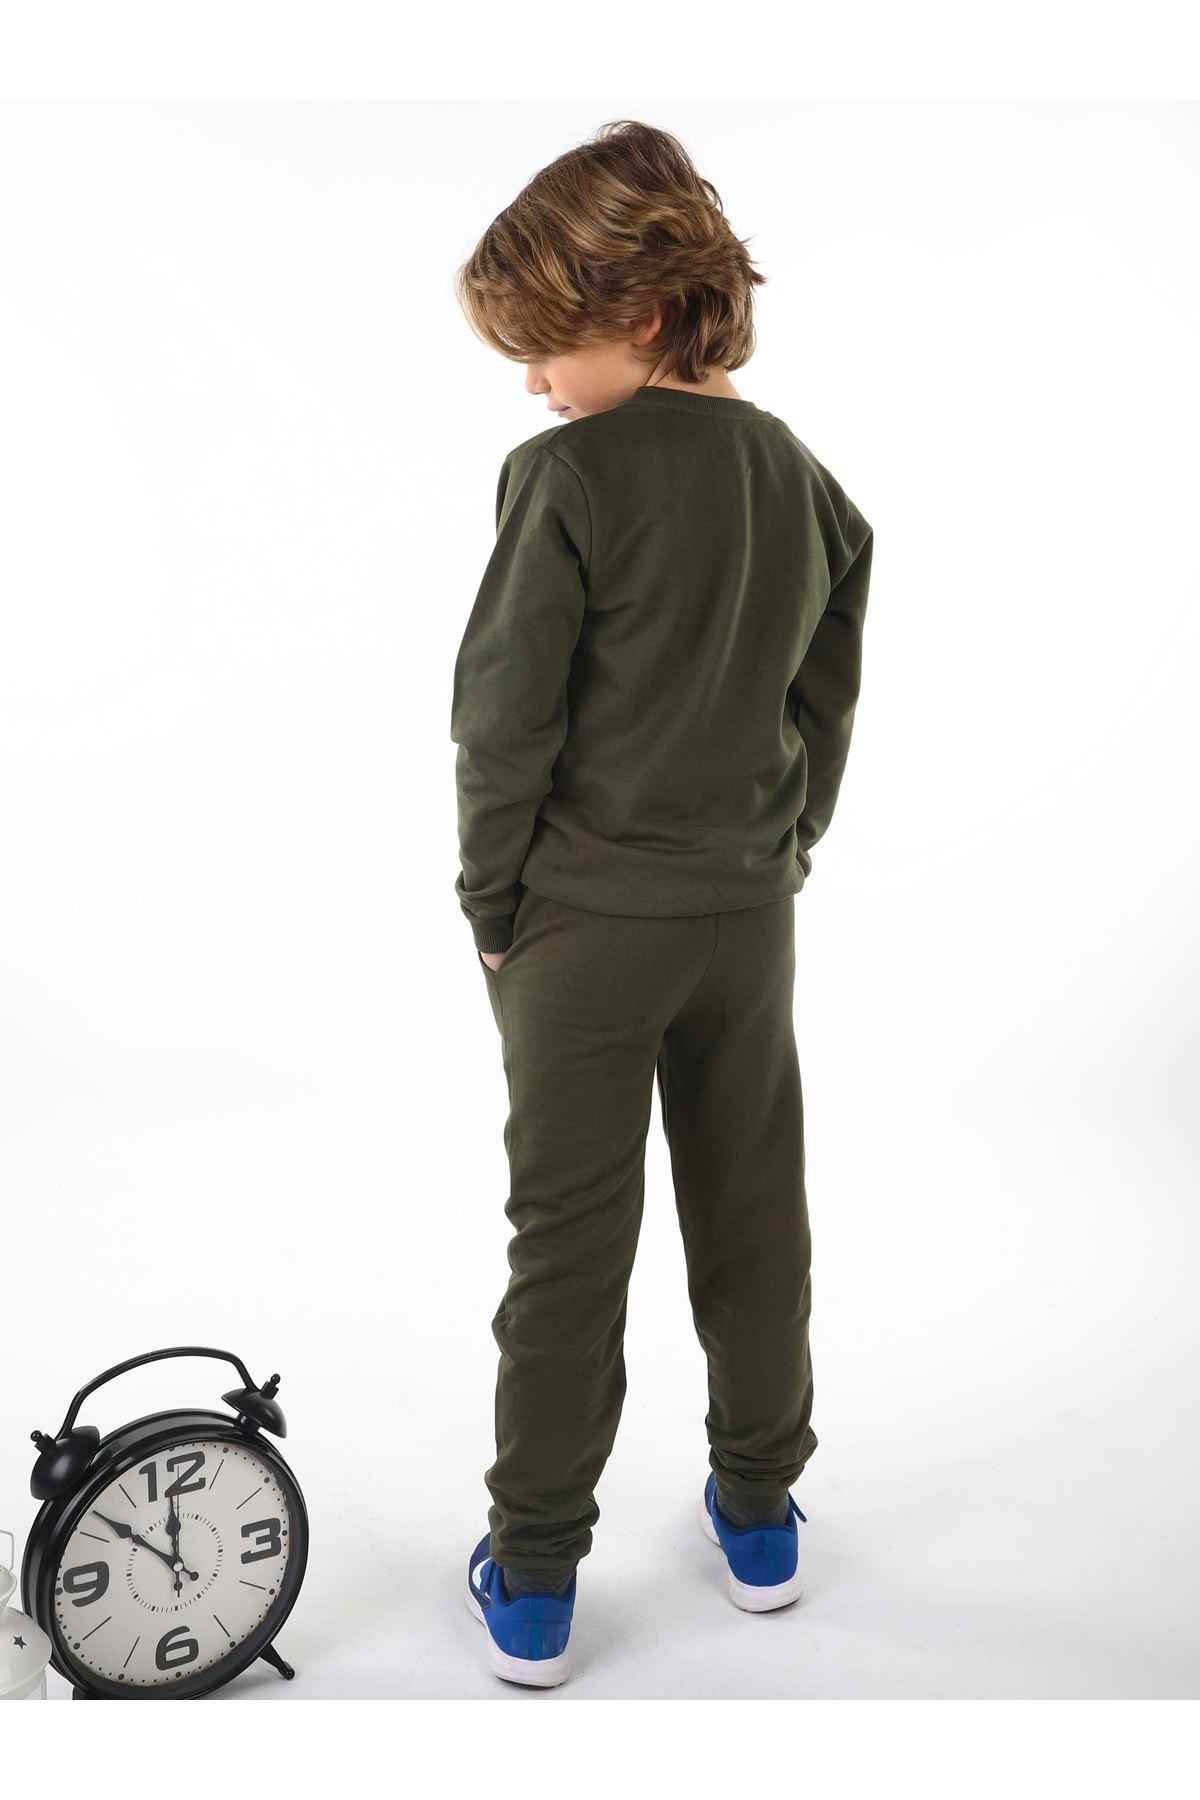 Khaki Seasonal Male Child Sweatshirt